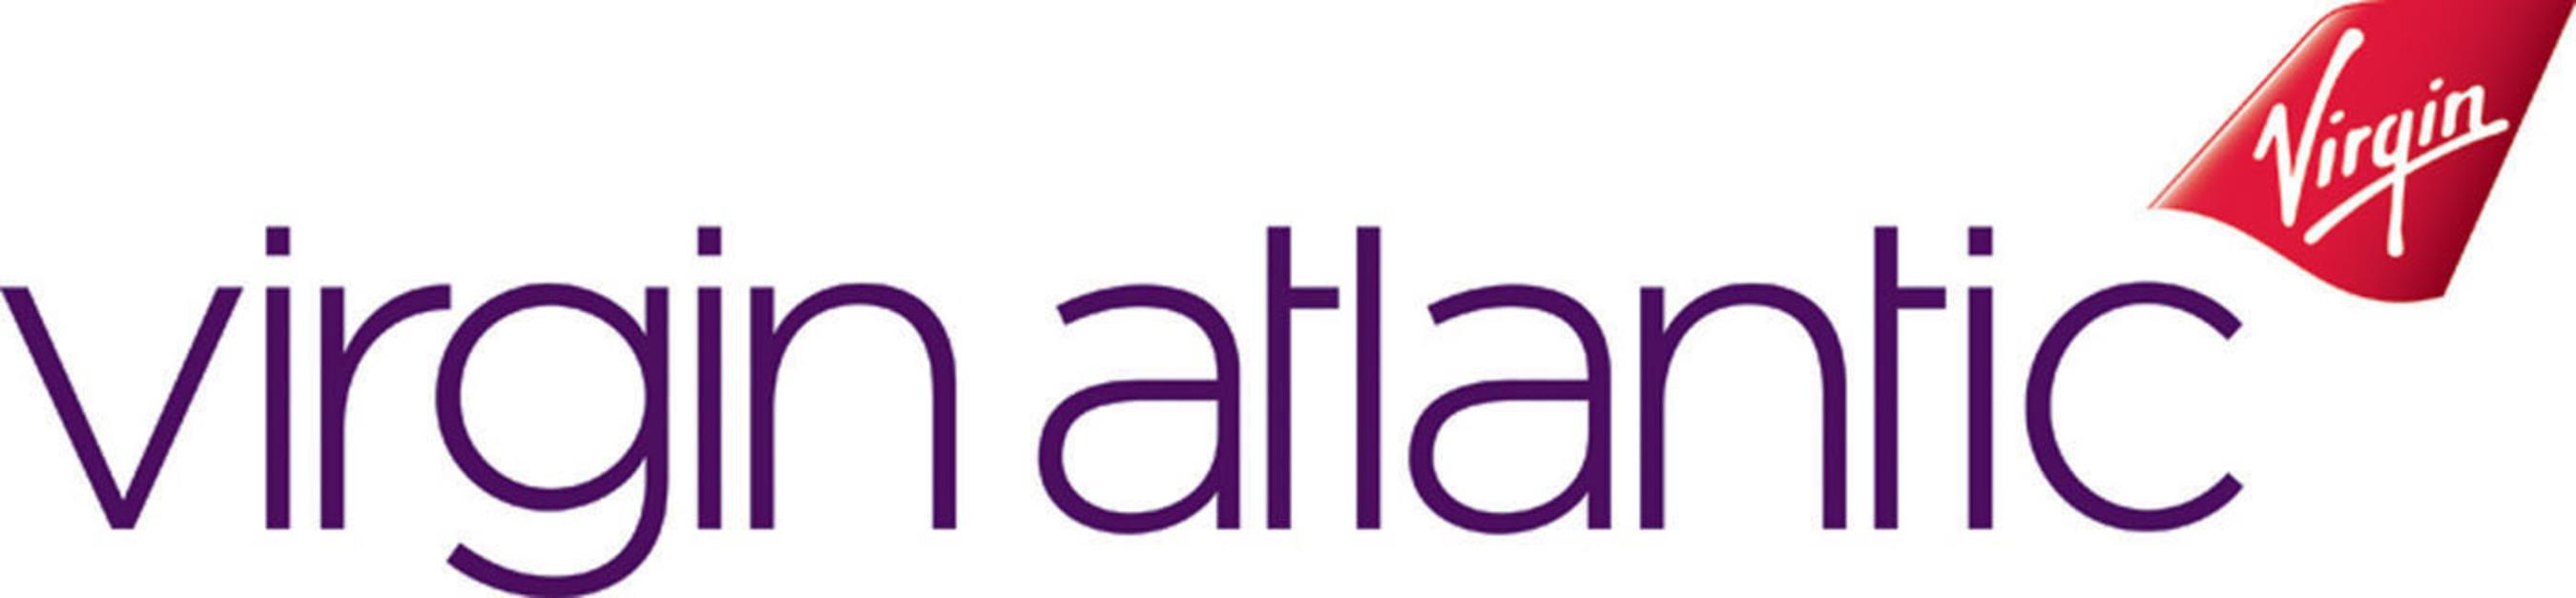 Virgin Atlantic Airways Ltd.